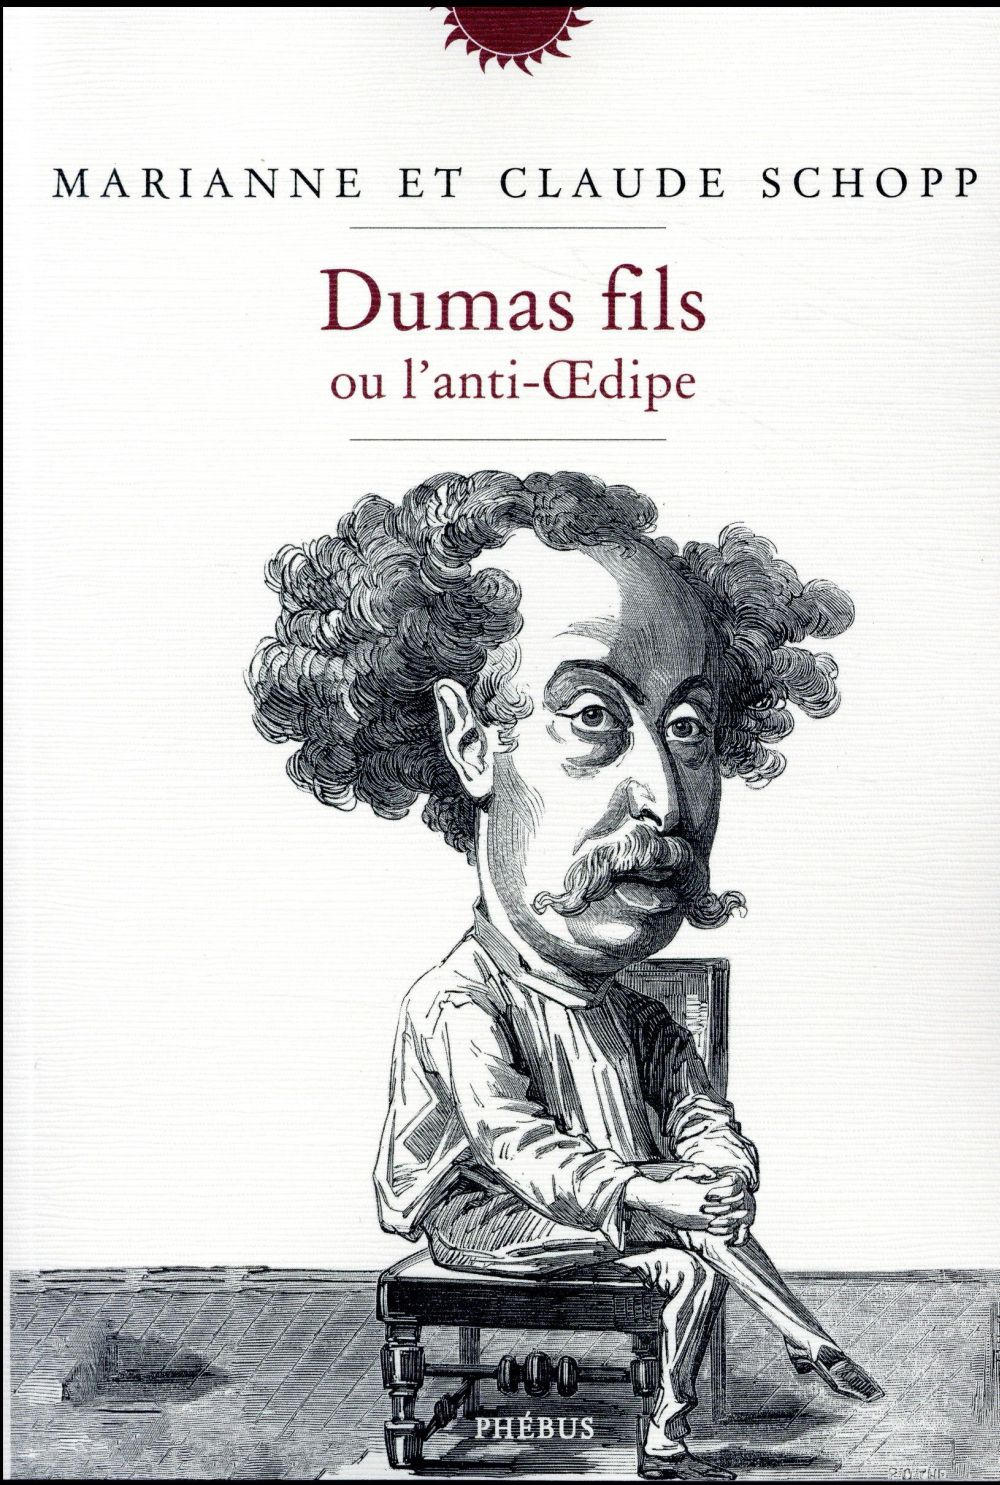 Dumas fils ou l'anti-Oedipe